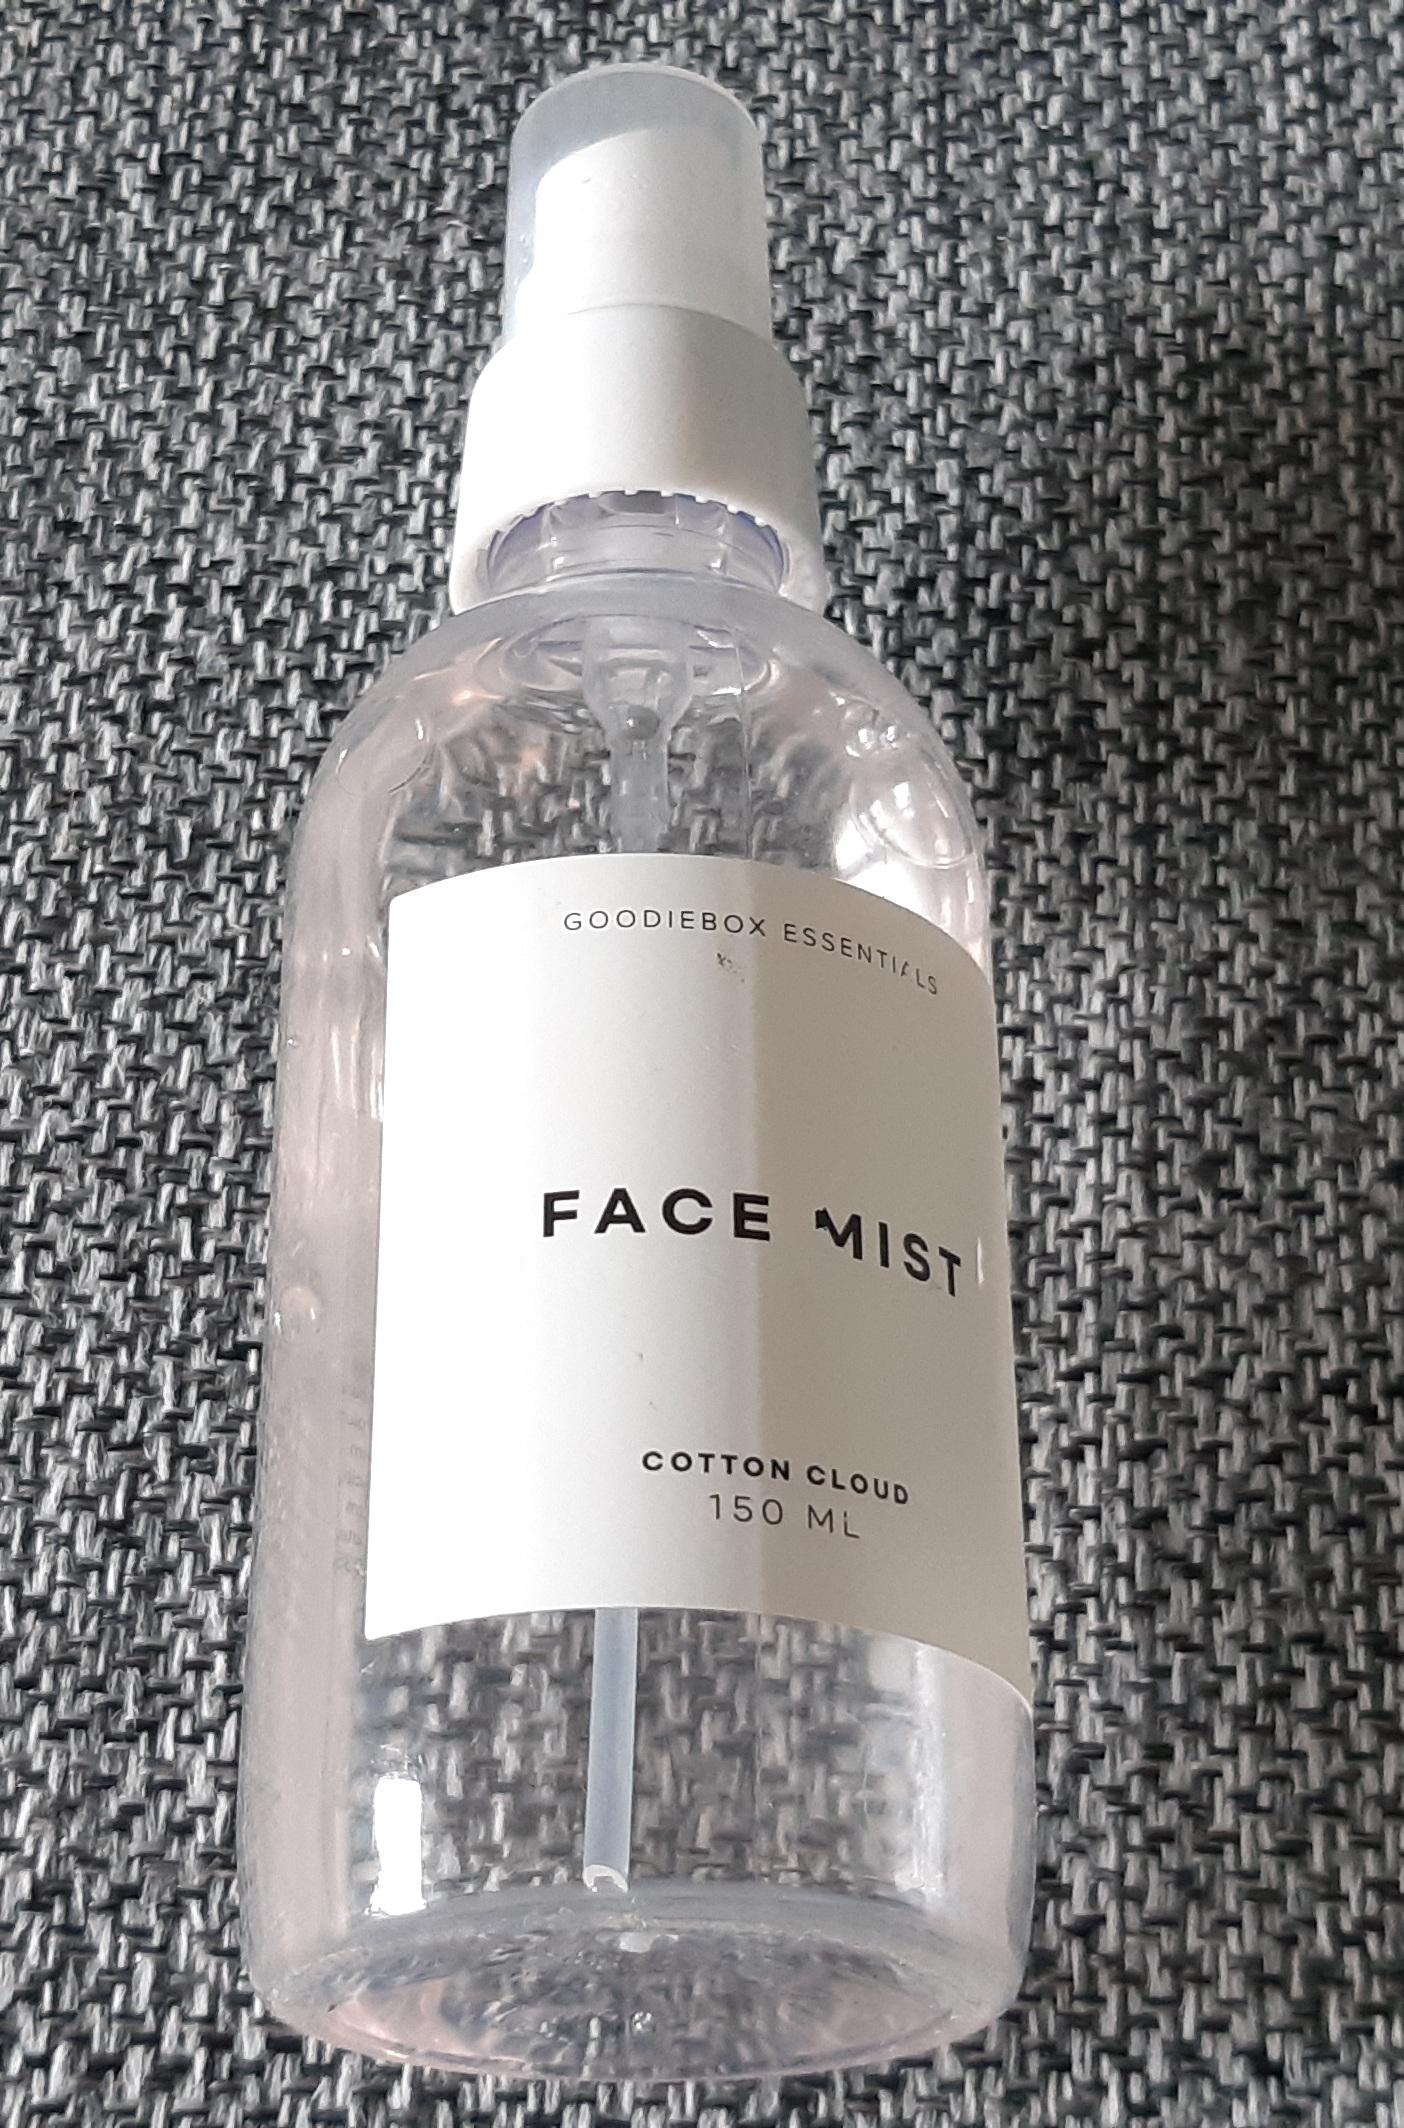 Goodiebox Essentials Face Mist